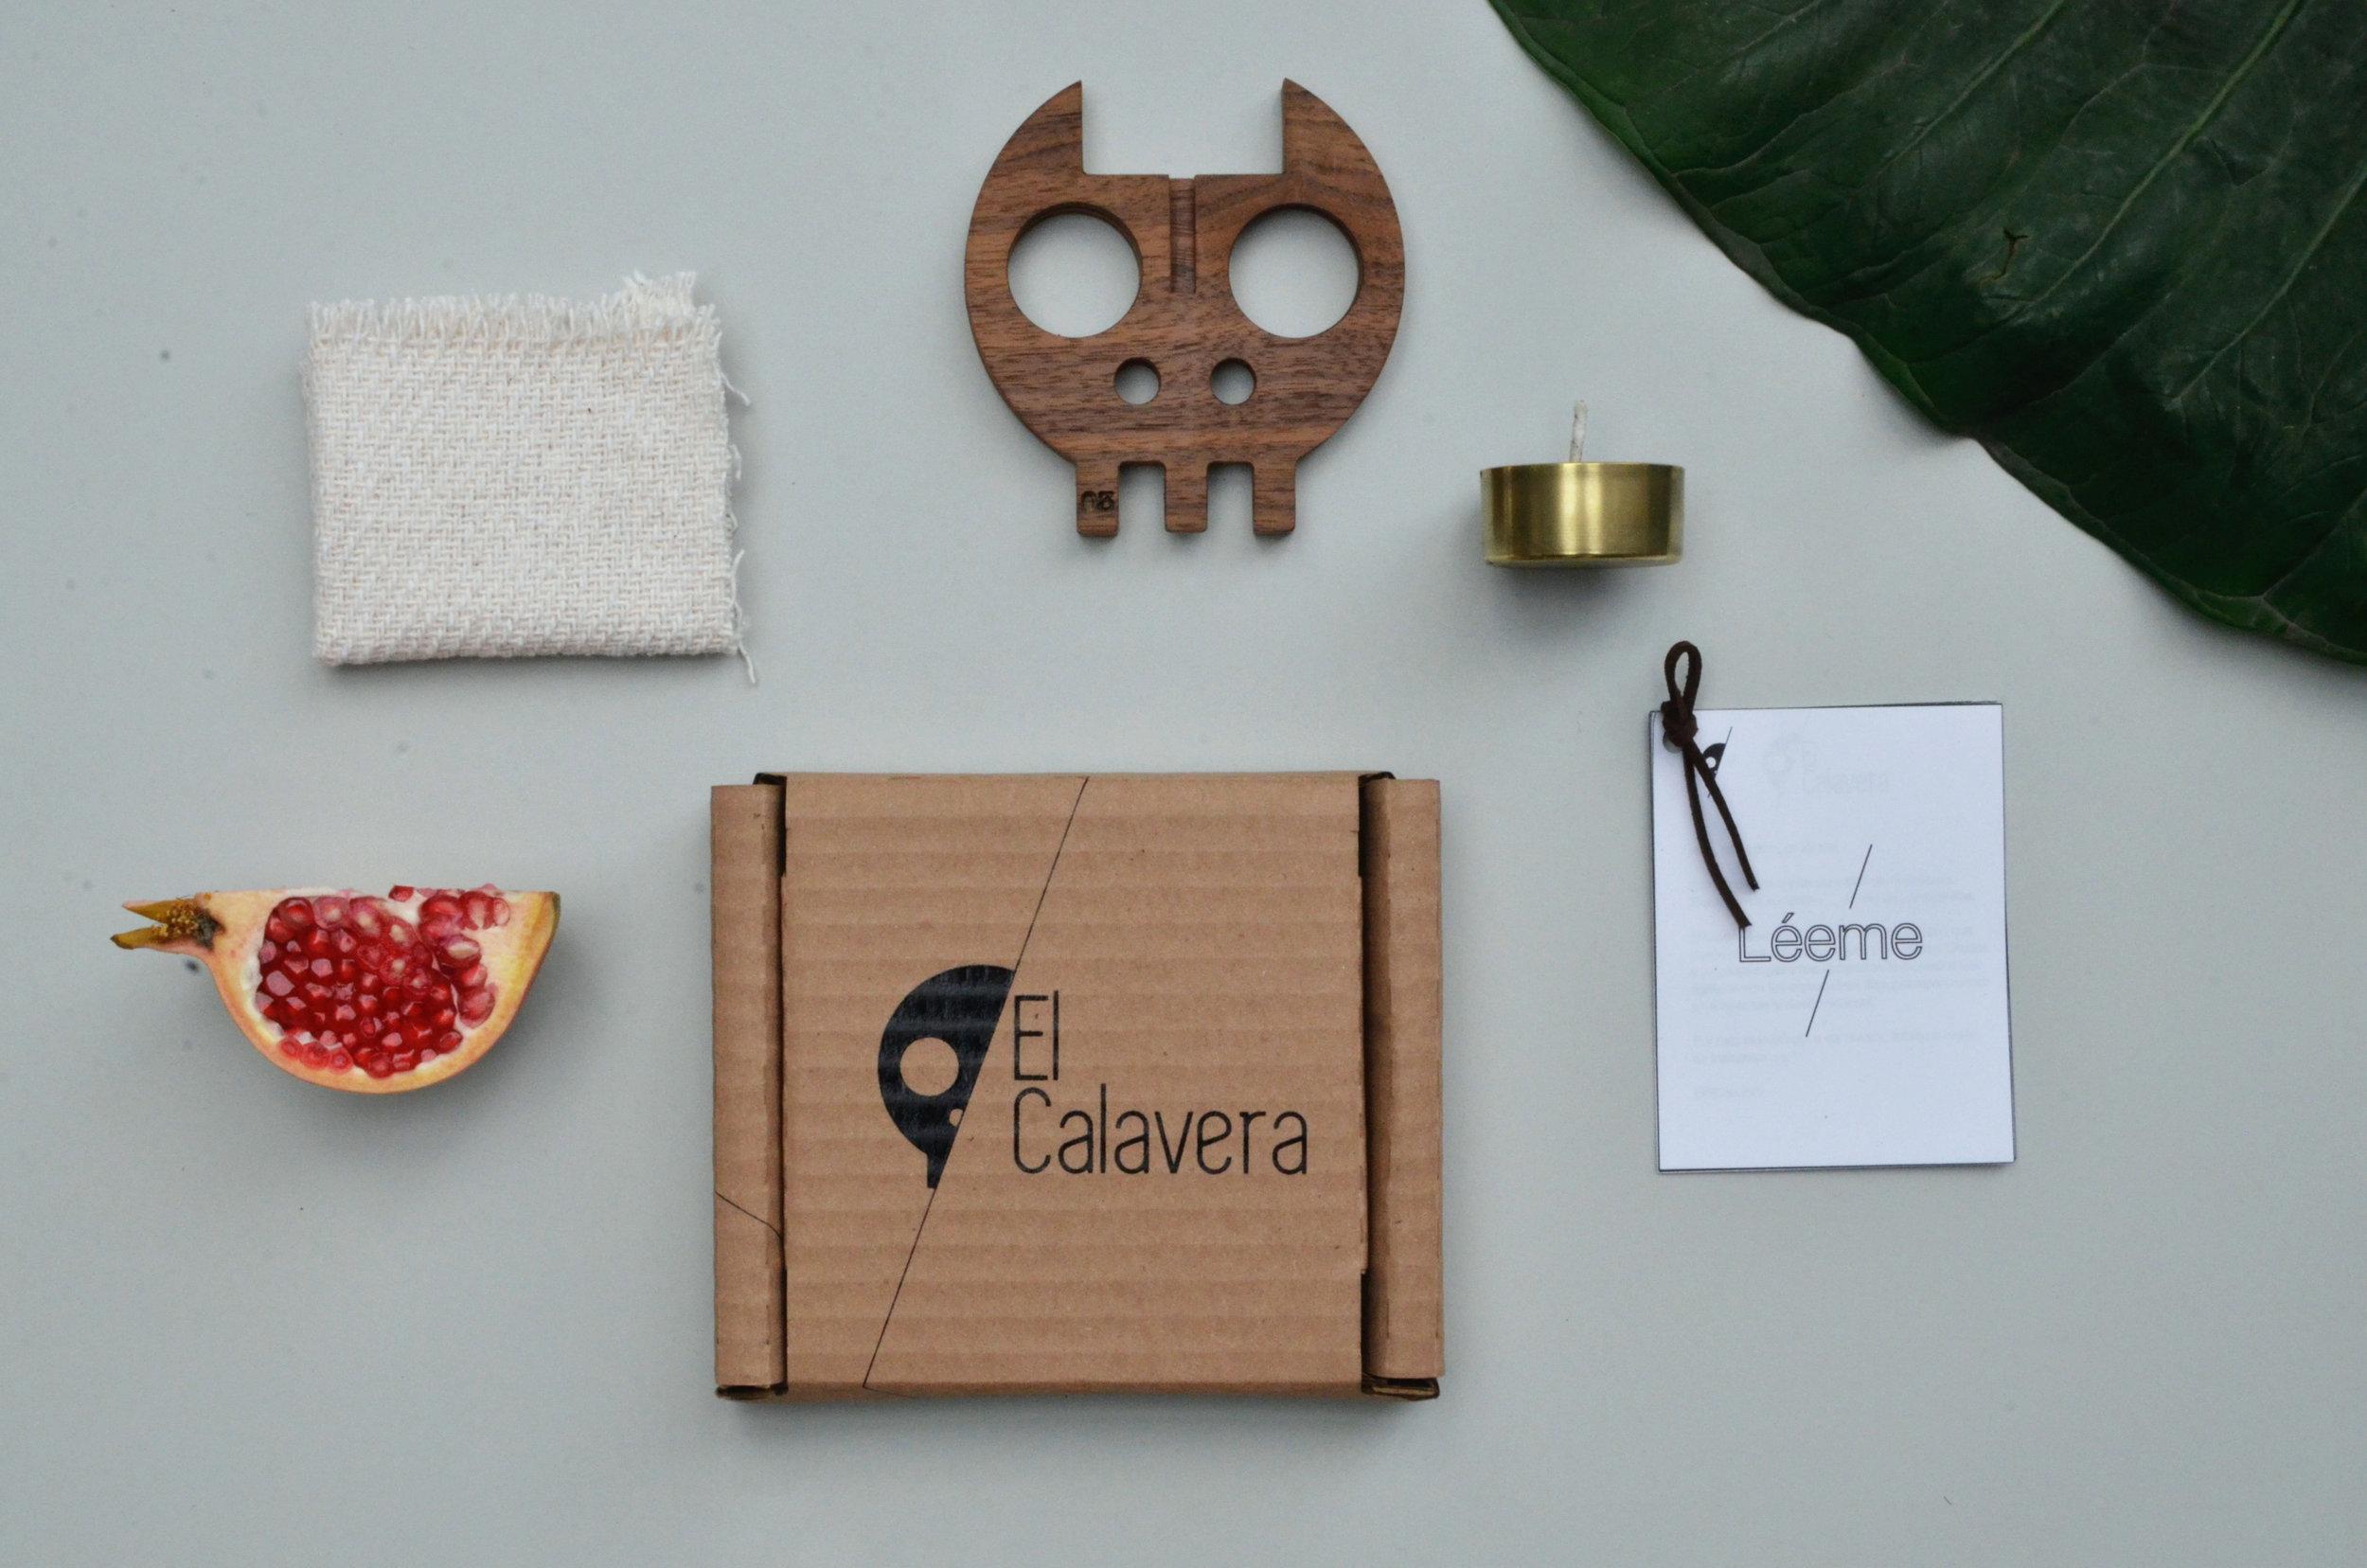 ElCalavera1.jpg